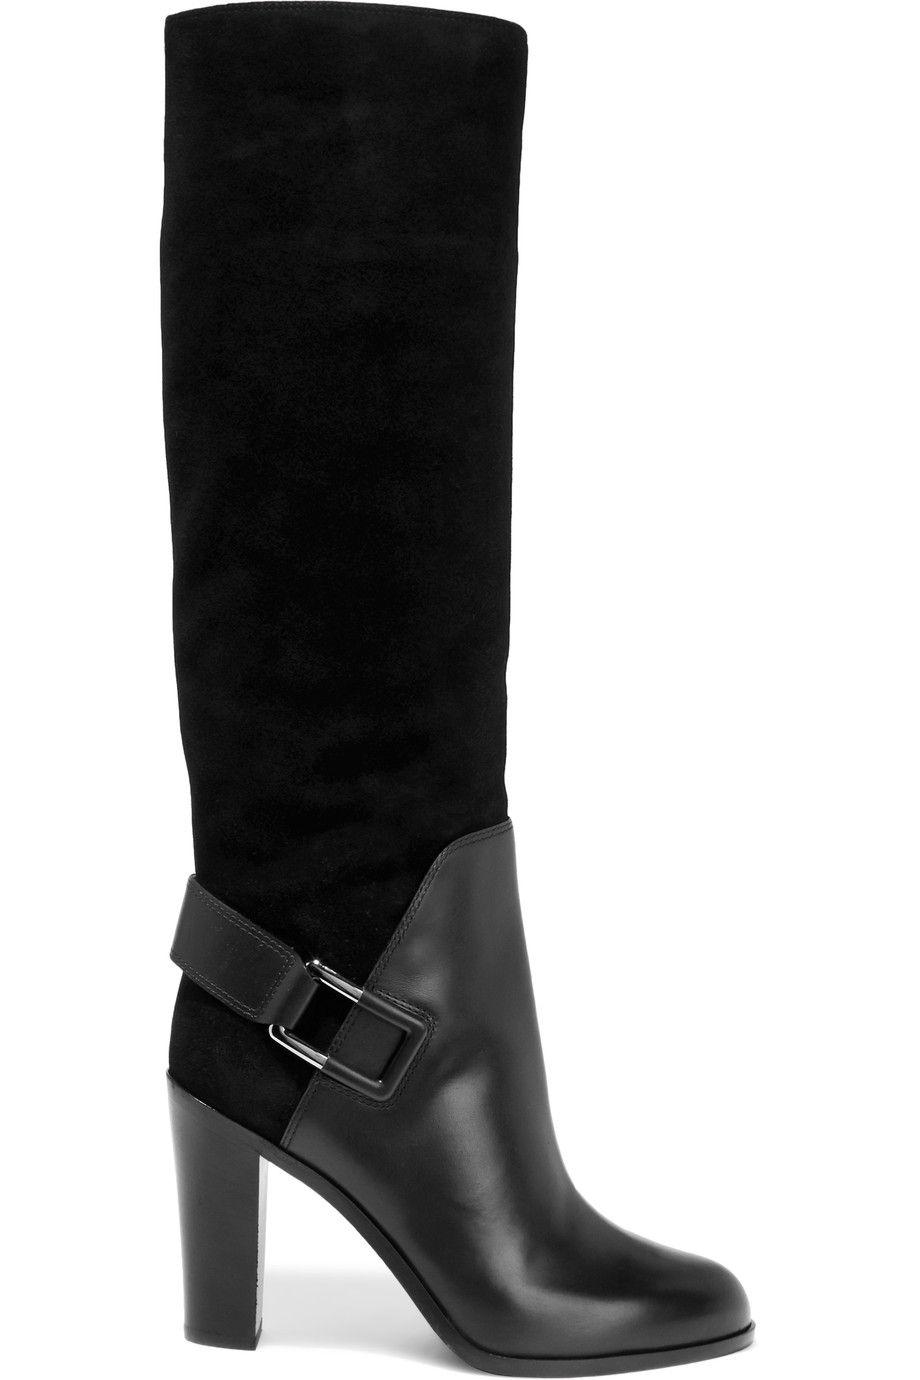 panelled boots - Black Sergio Rossi K1arL